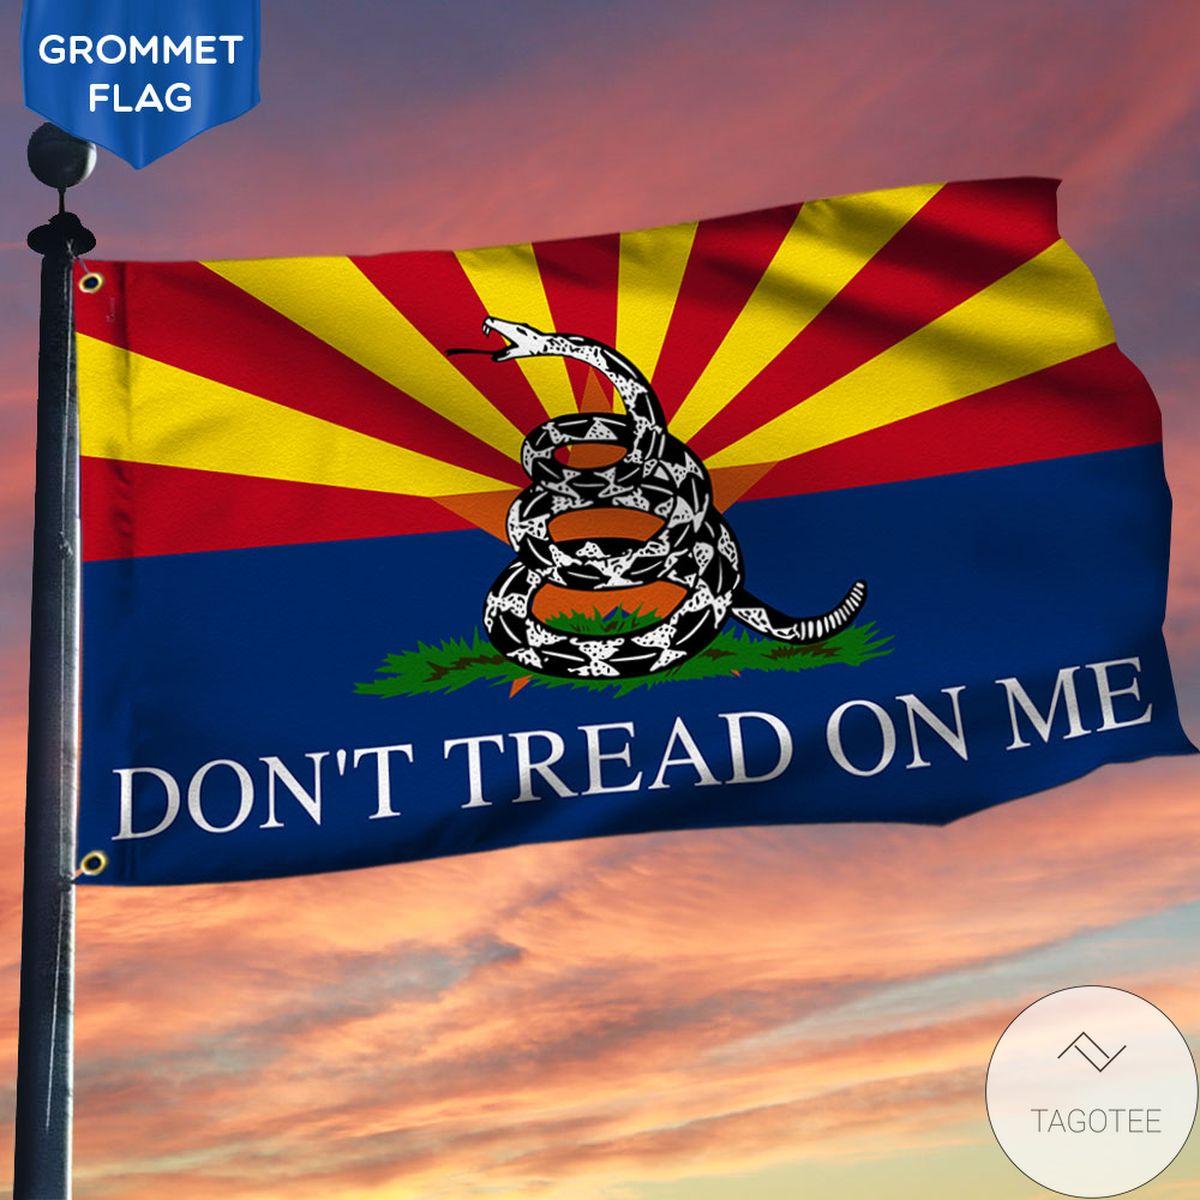 Arizona Grommet Flag Gadsden Don't Tread On Me Flag